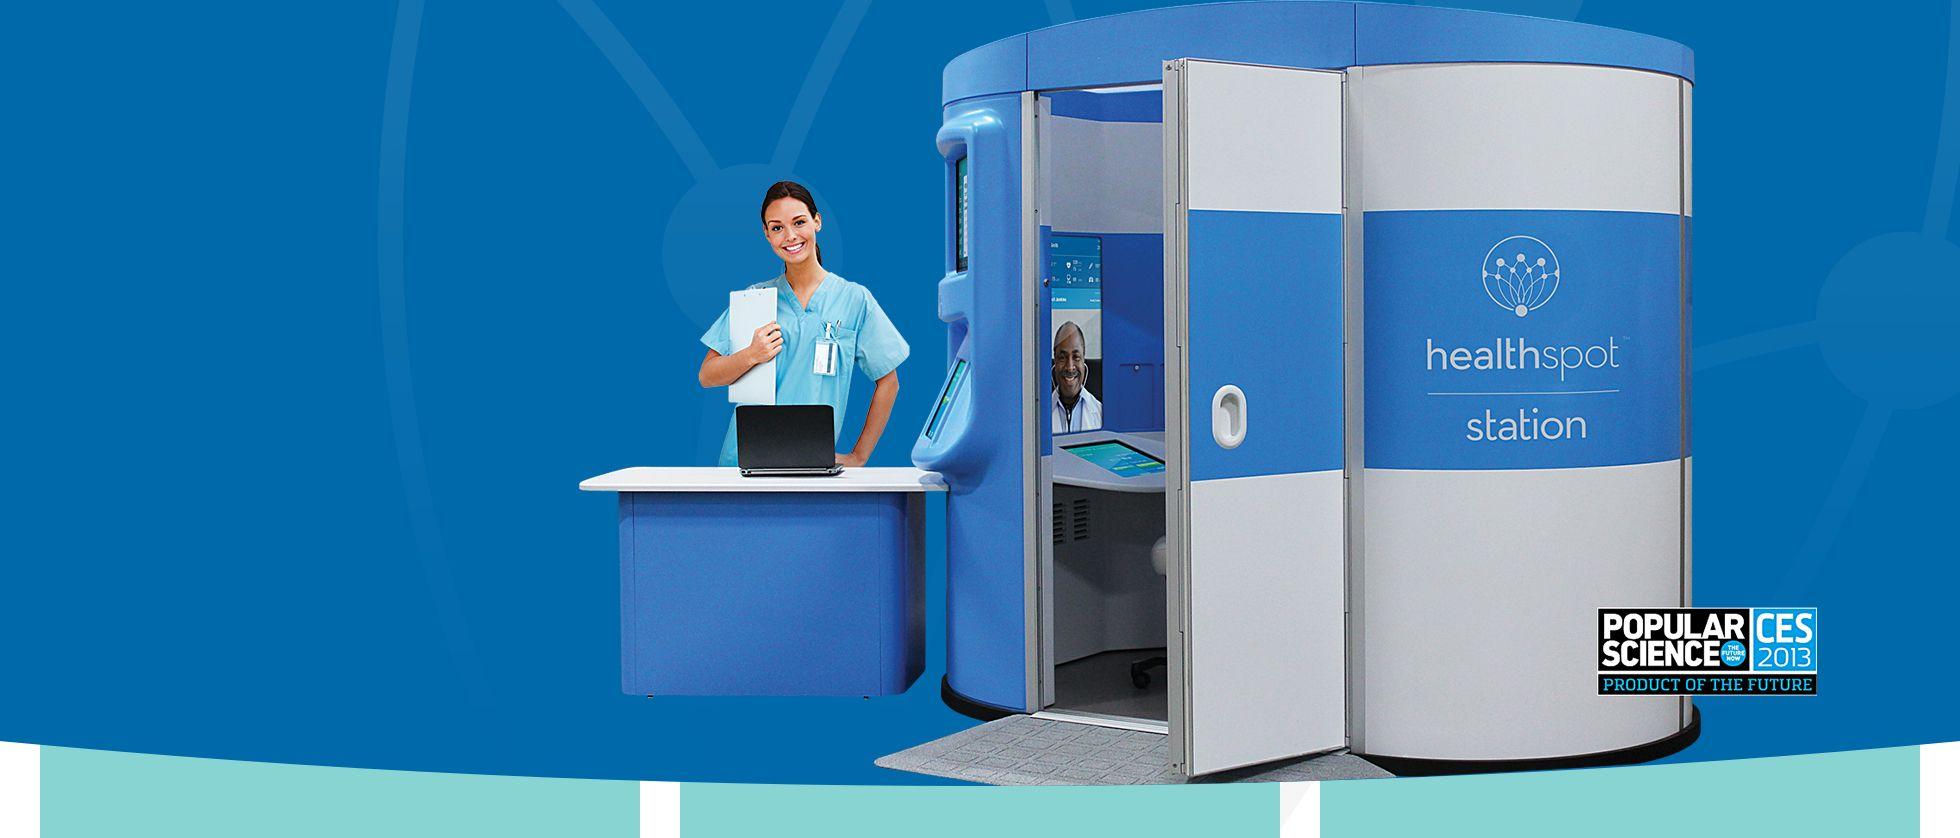 HealthSpot telemedicine medical kiosk for remote primary